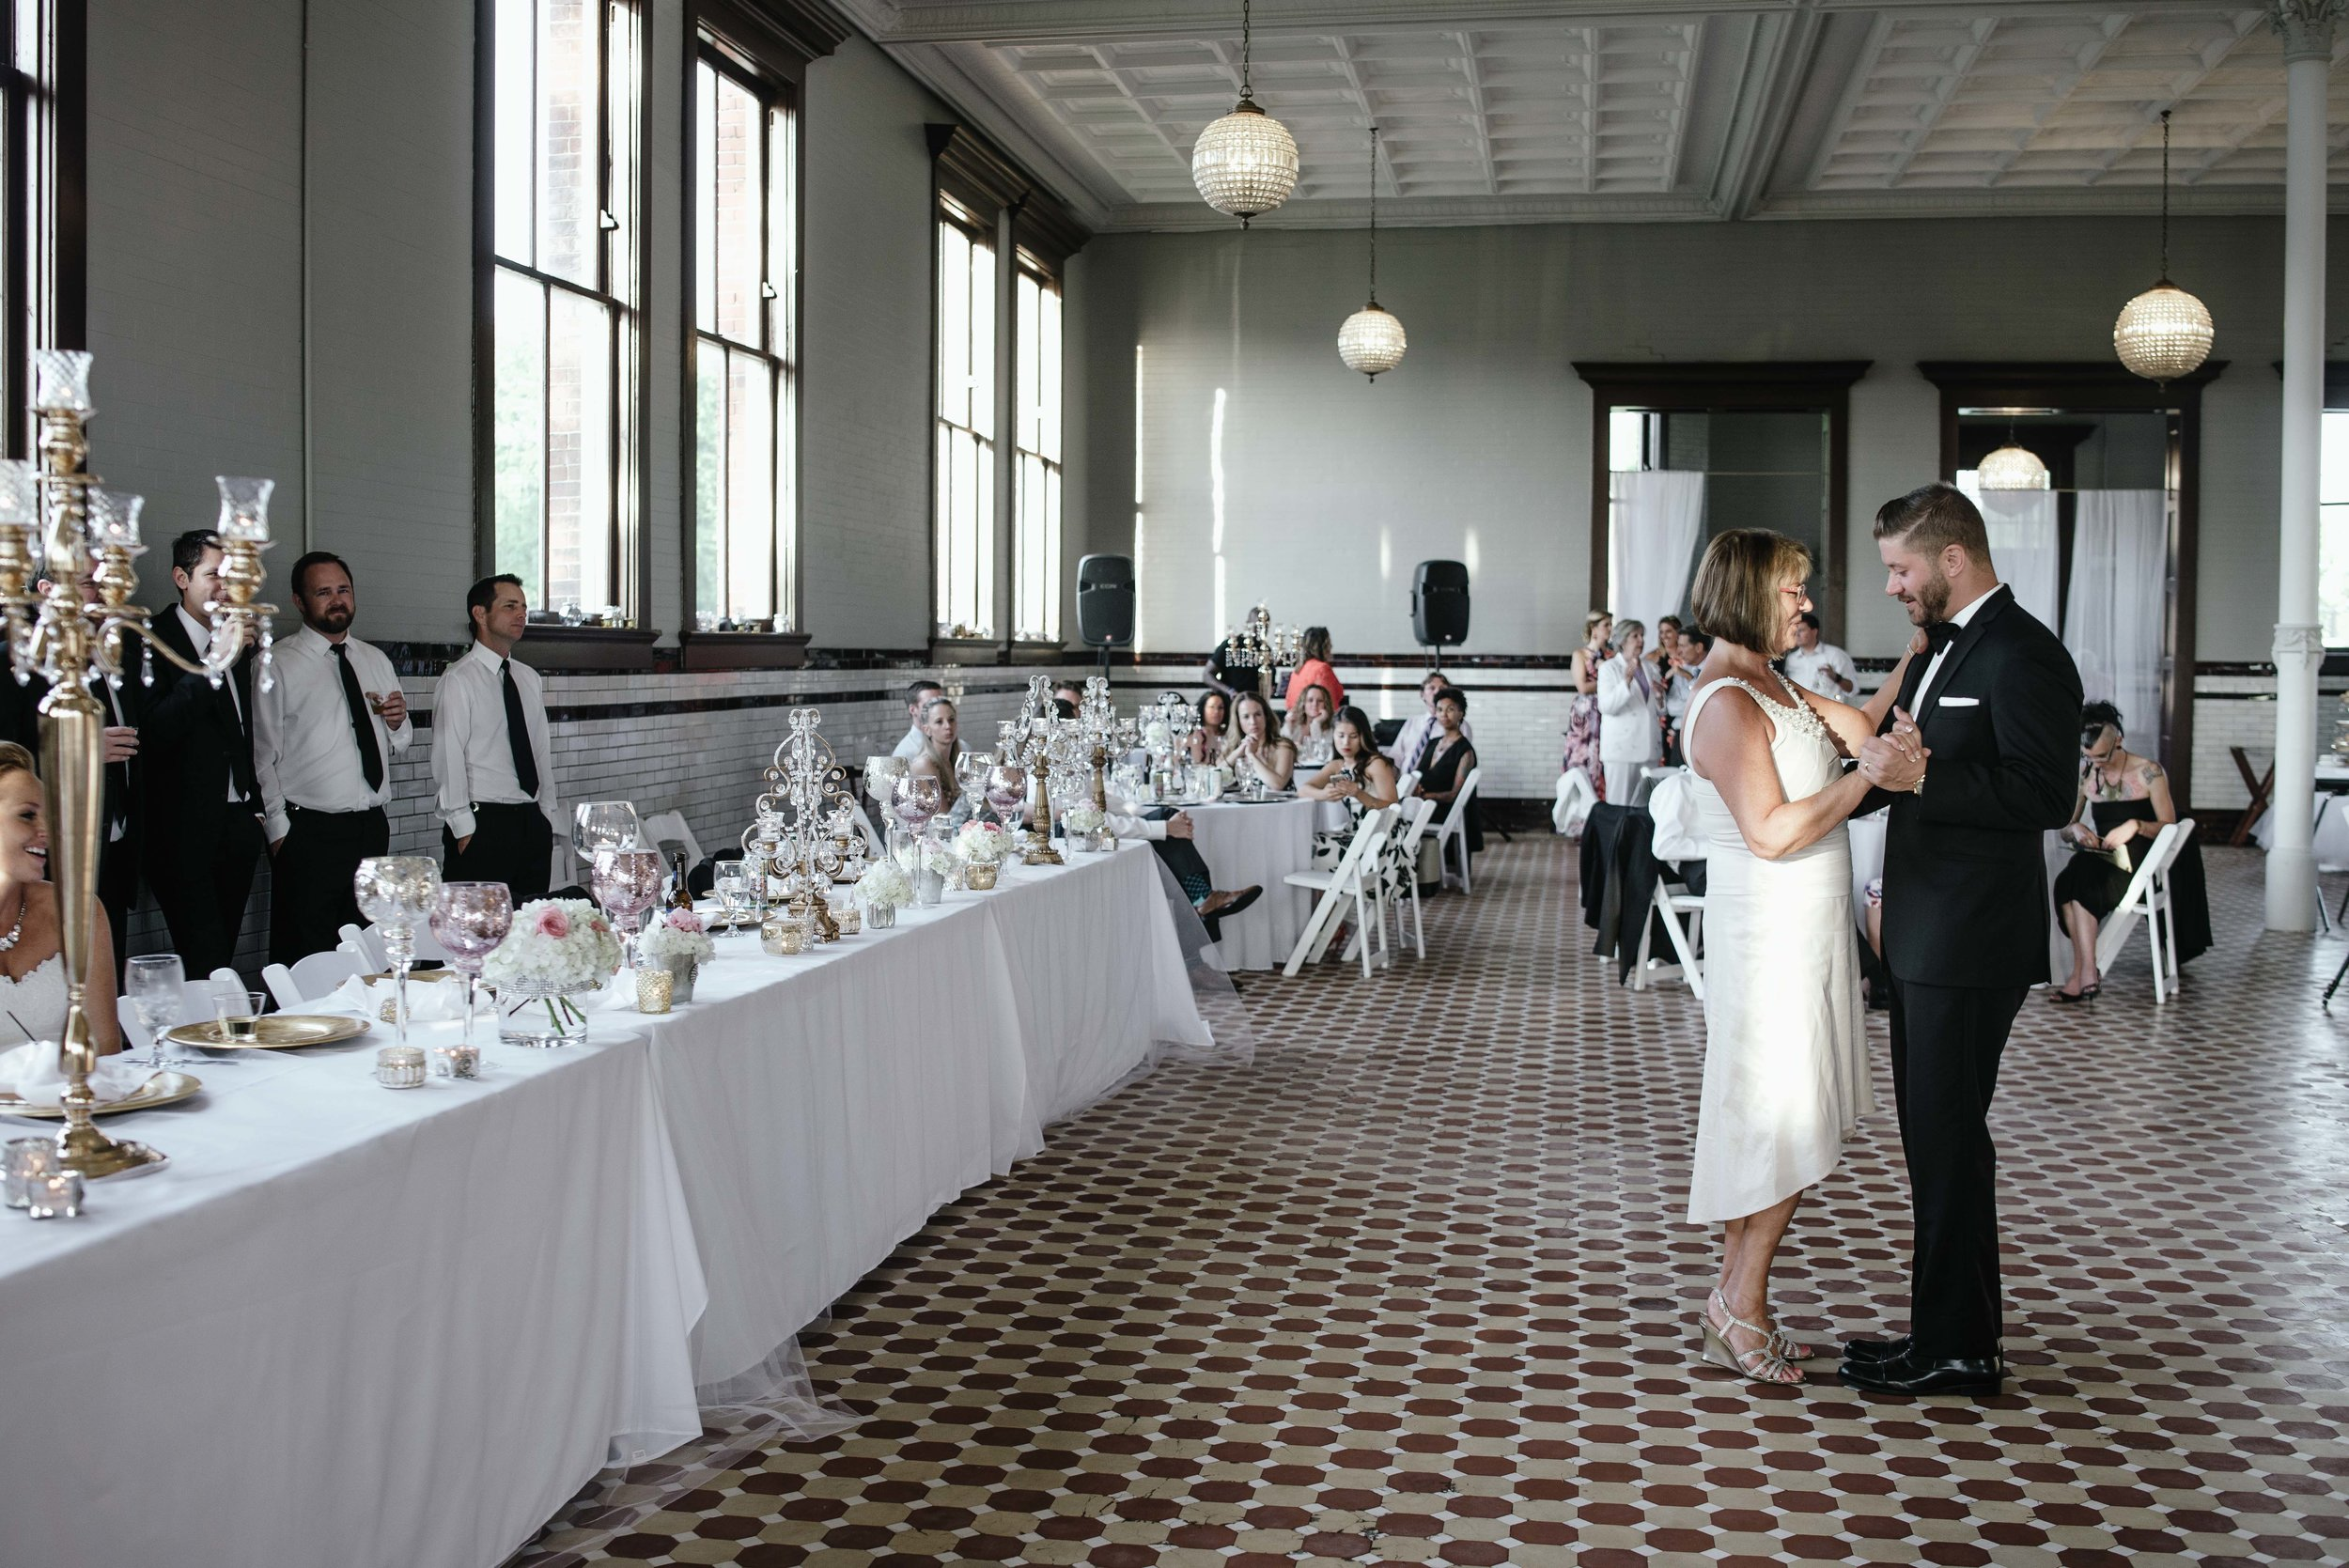 Mina-Steve-Blog-Indianapolis-Wedding-158.jpg